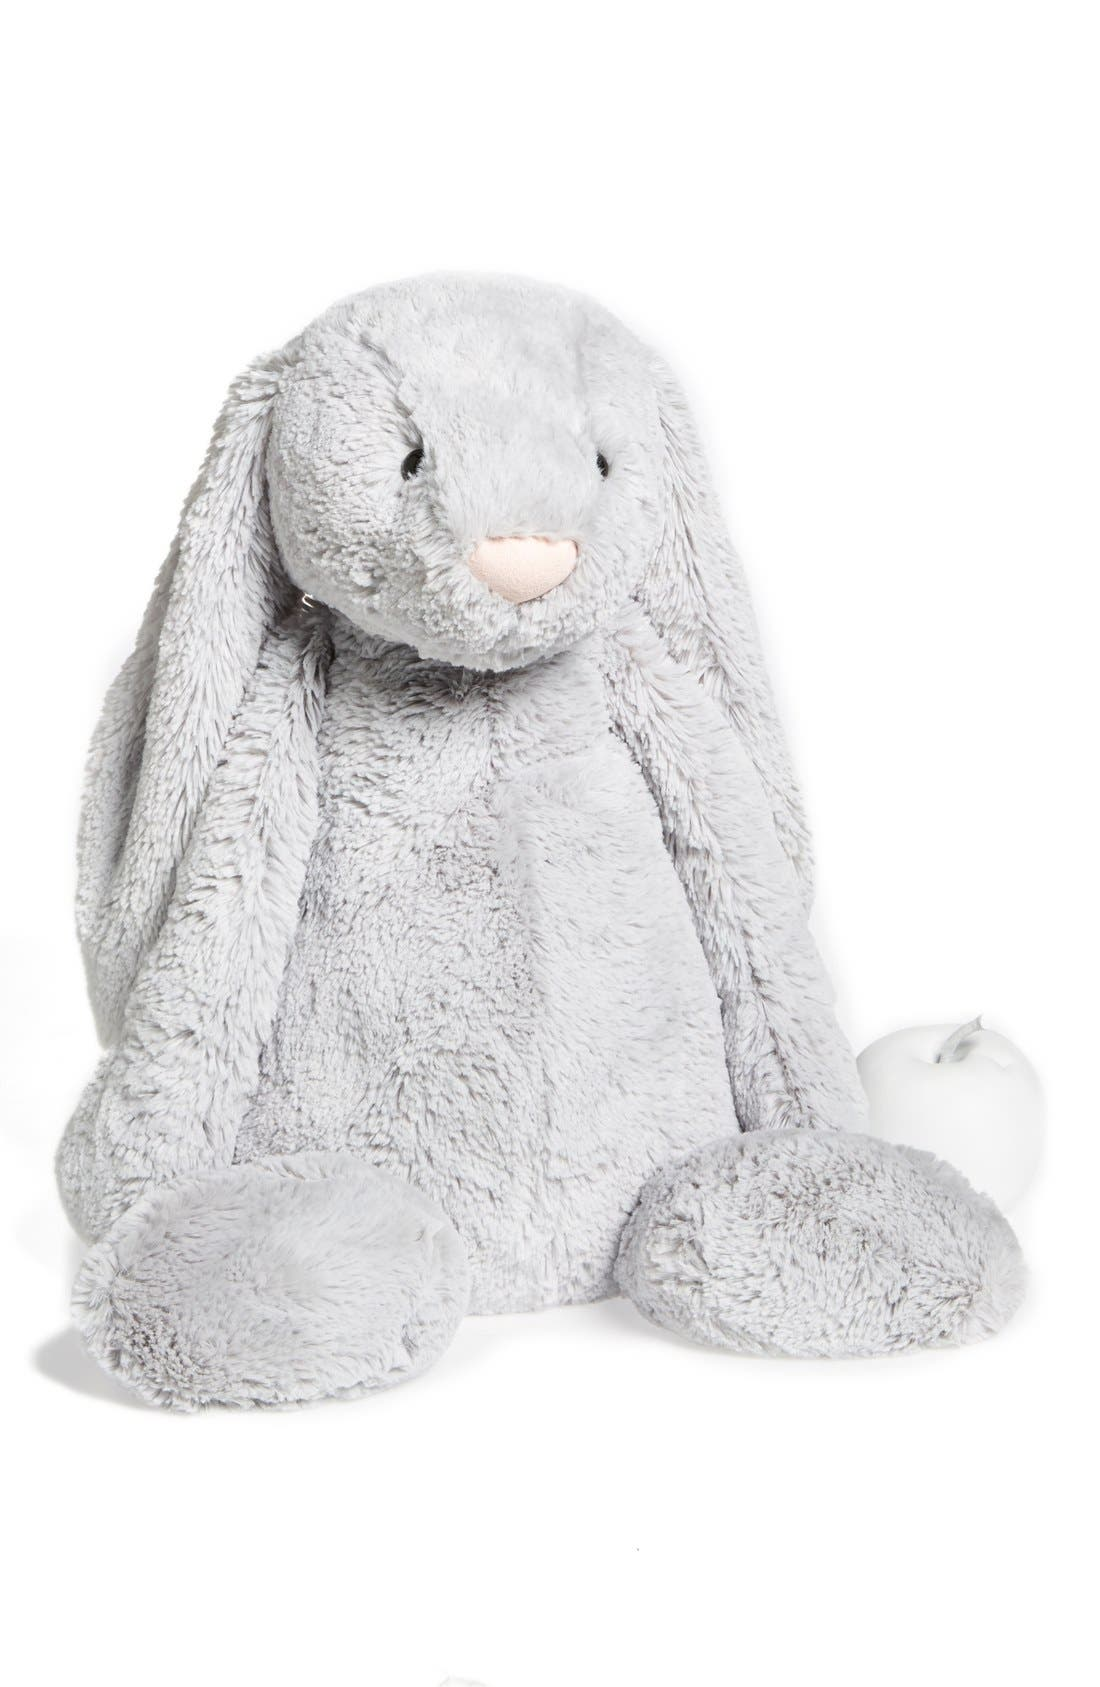 Jellycat Bunny Stuffed Animal (21 Inch)